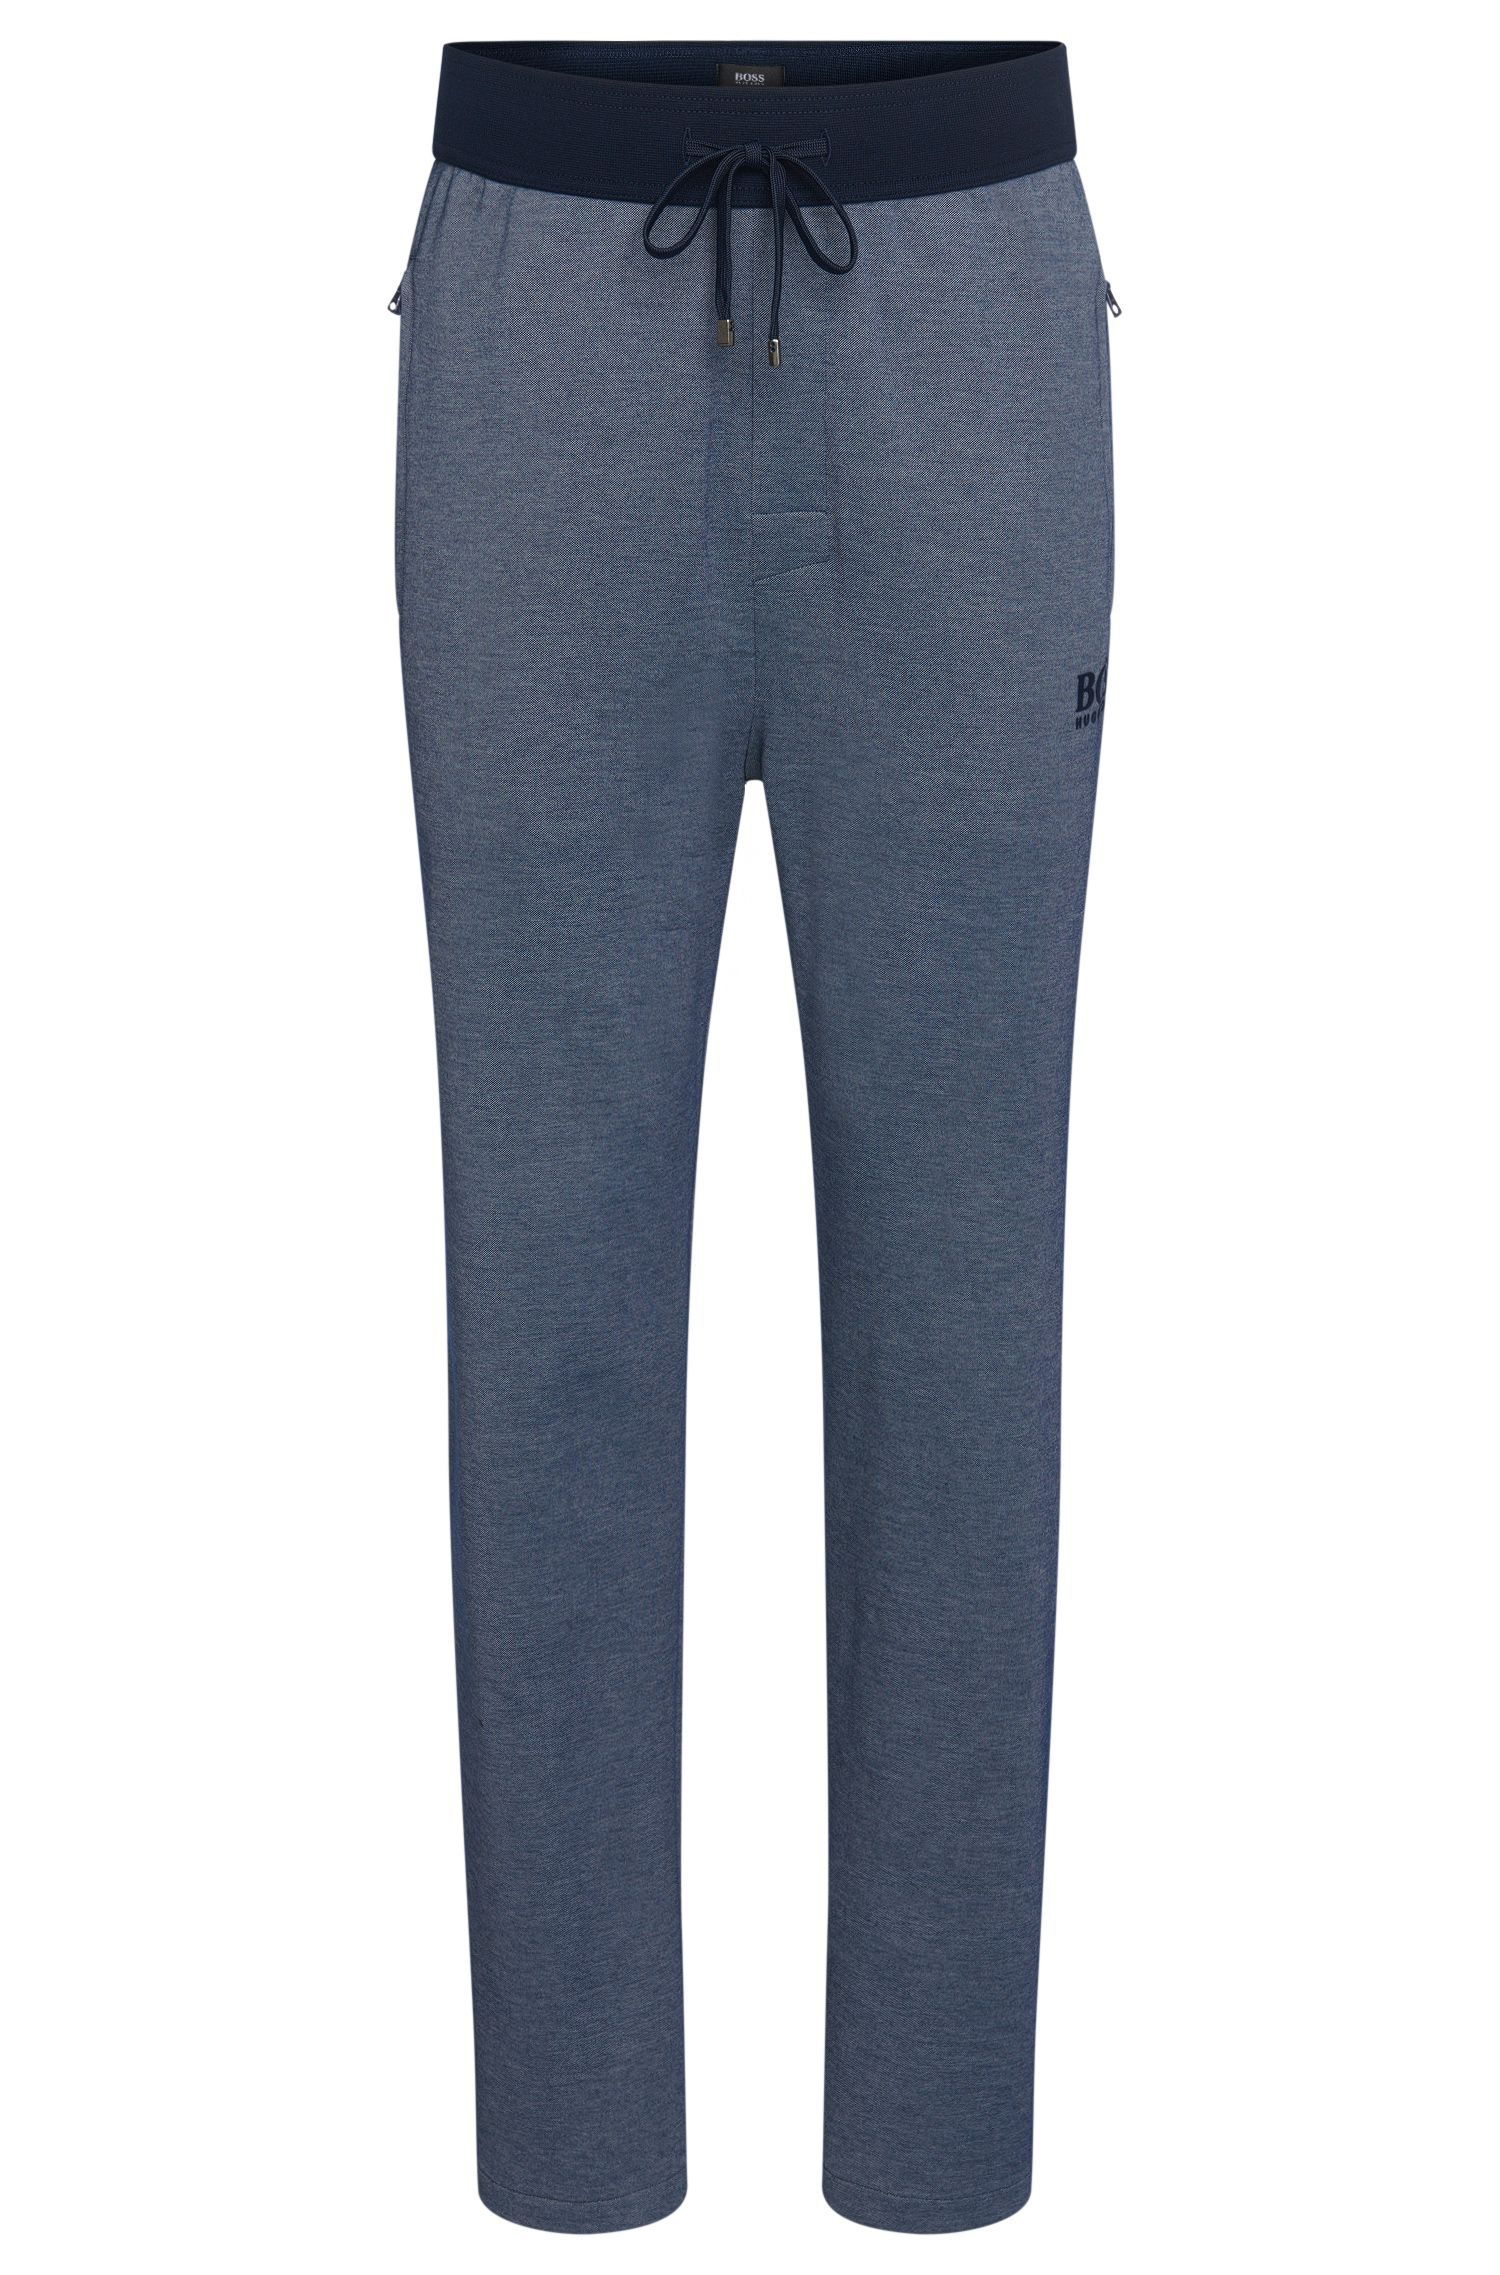 Pantaloni felpati in misto cotone con coulisse: 'Long Pant'